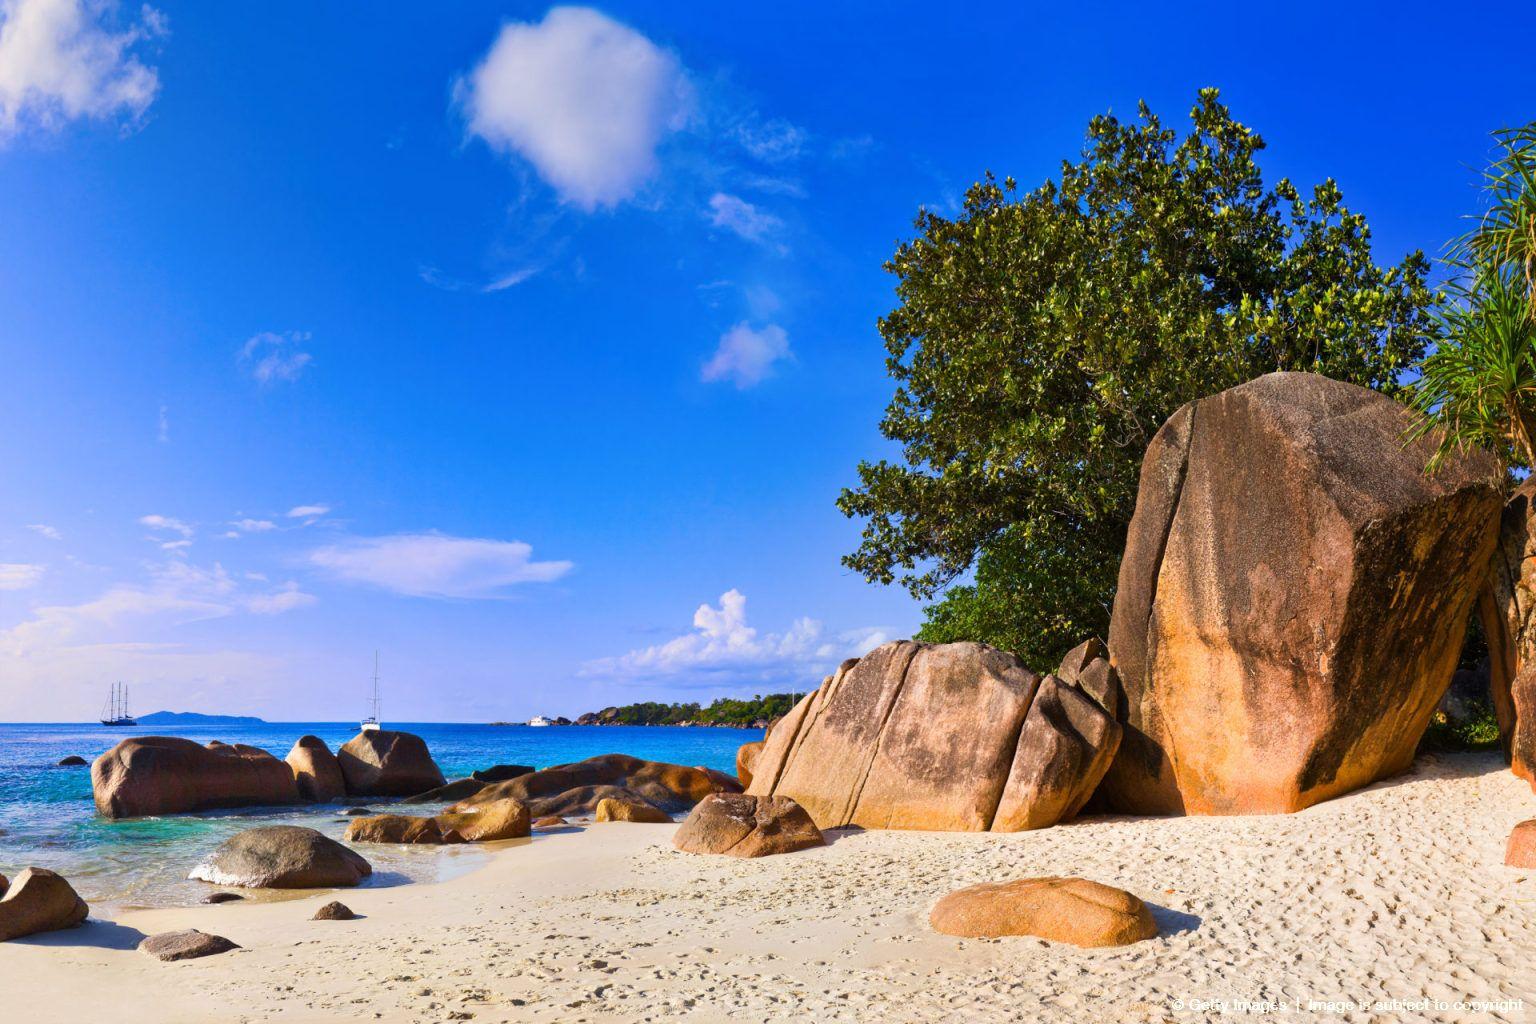 Beach Anse Lazio at Seychelles - nature background | Beach ...